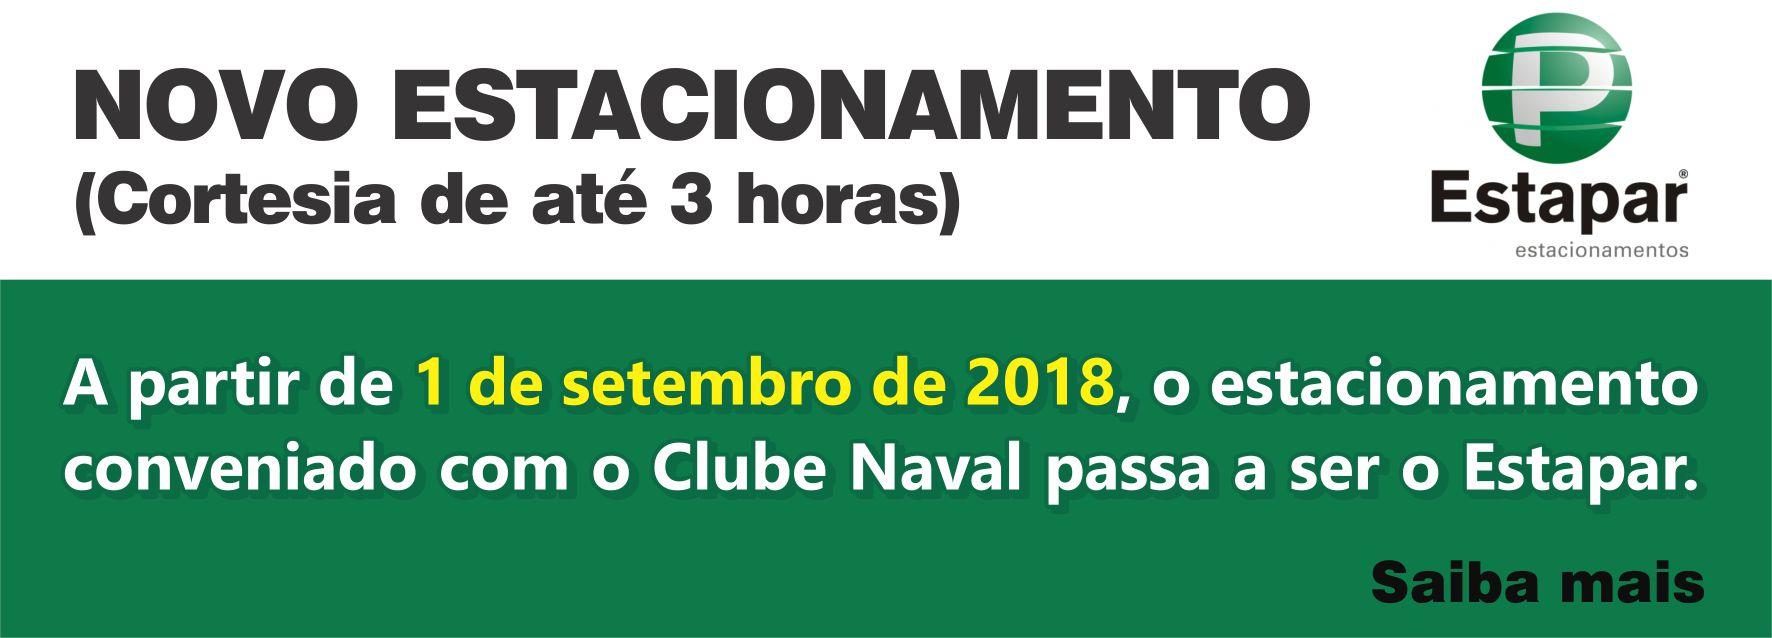 https://www.clubenaval.org.br/novo/novo-estacionamento-estapar-partir-de-setembro-2018